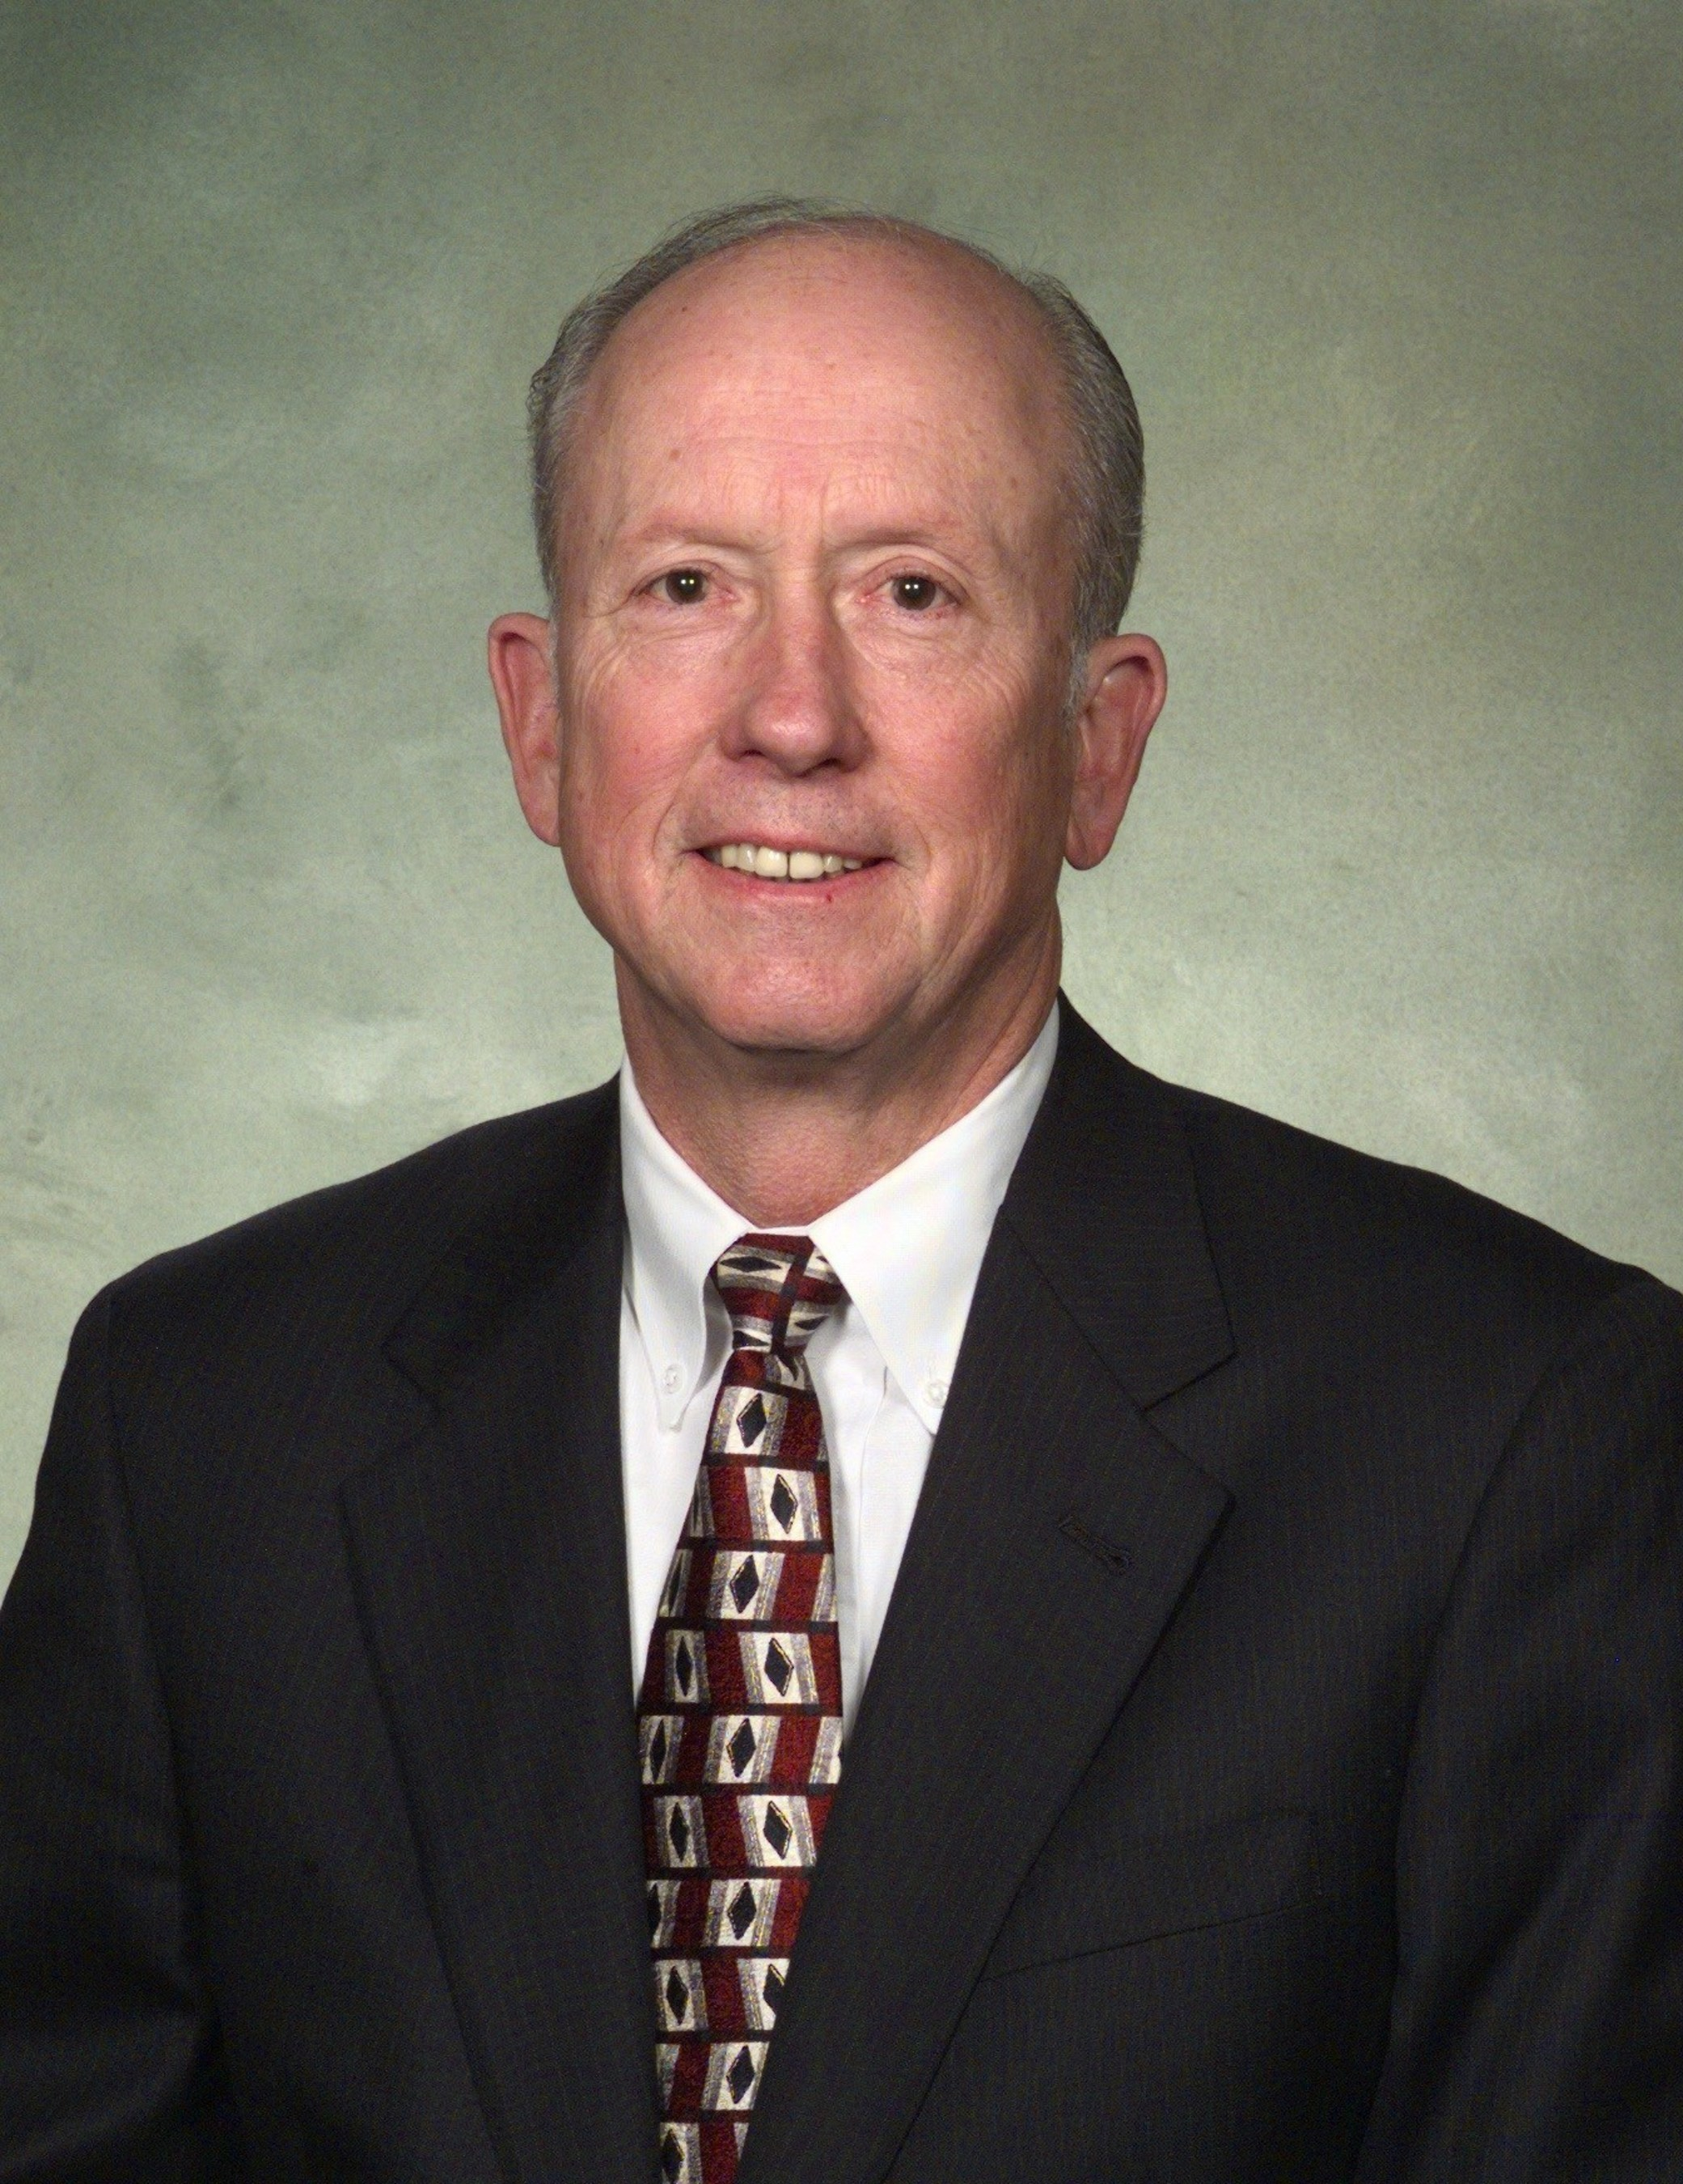 Brigadier General (Ret) USAF Raymond Shulstad Joins TSOD.com